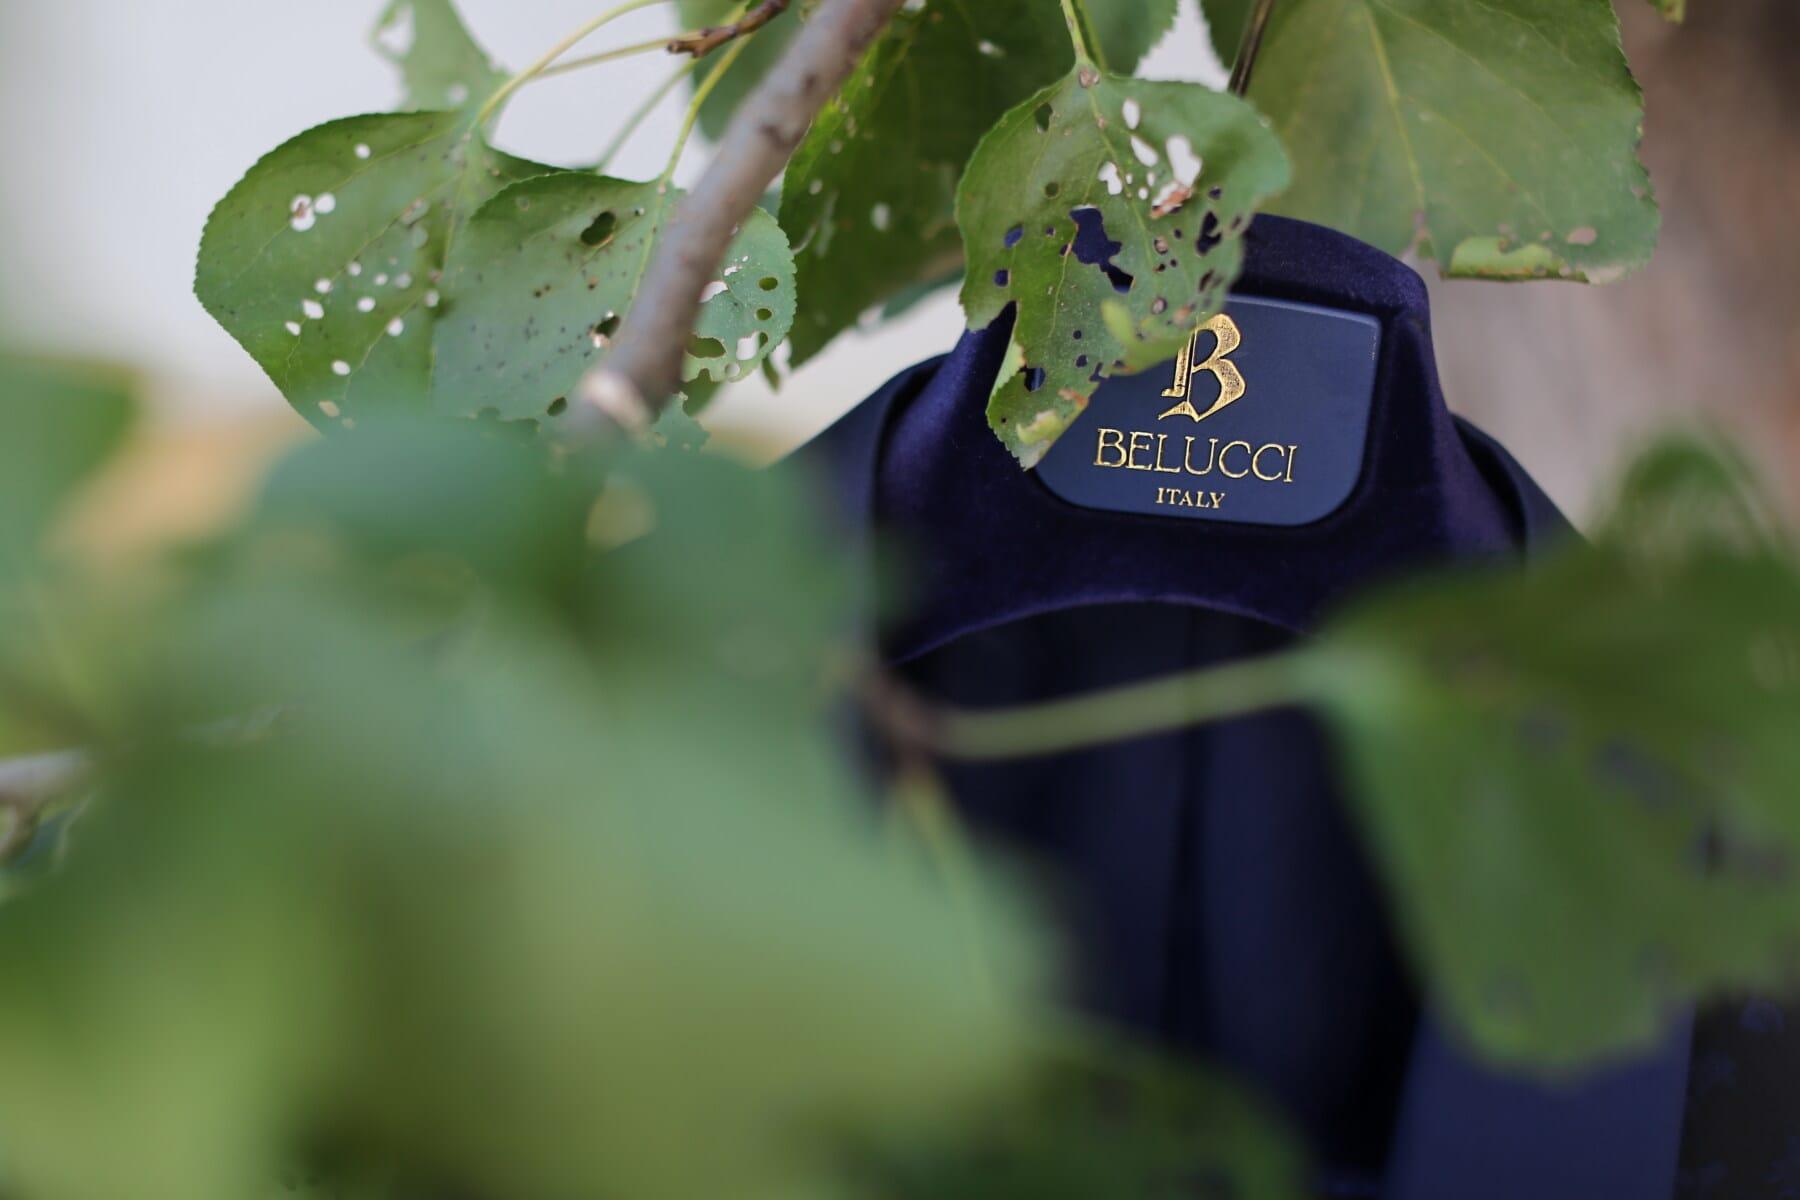 Belucci, italian, tuxedo suit, jacket, fancy, style, hanging, tree, leaf, outdoors